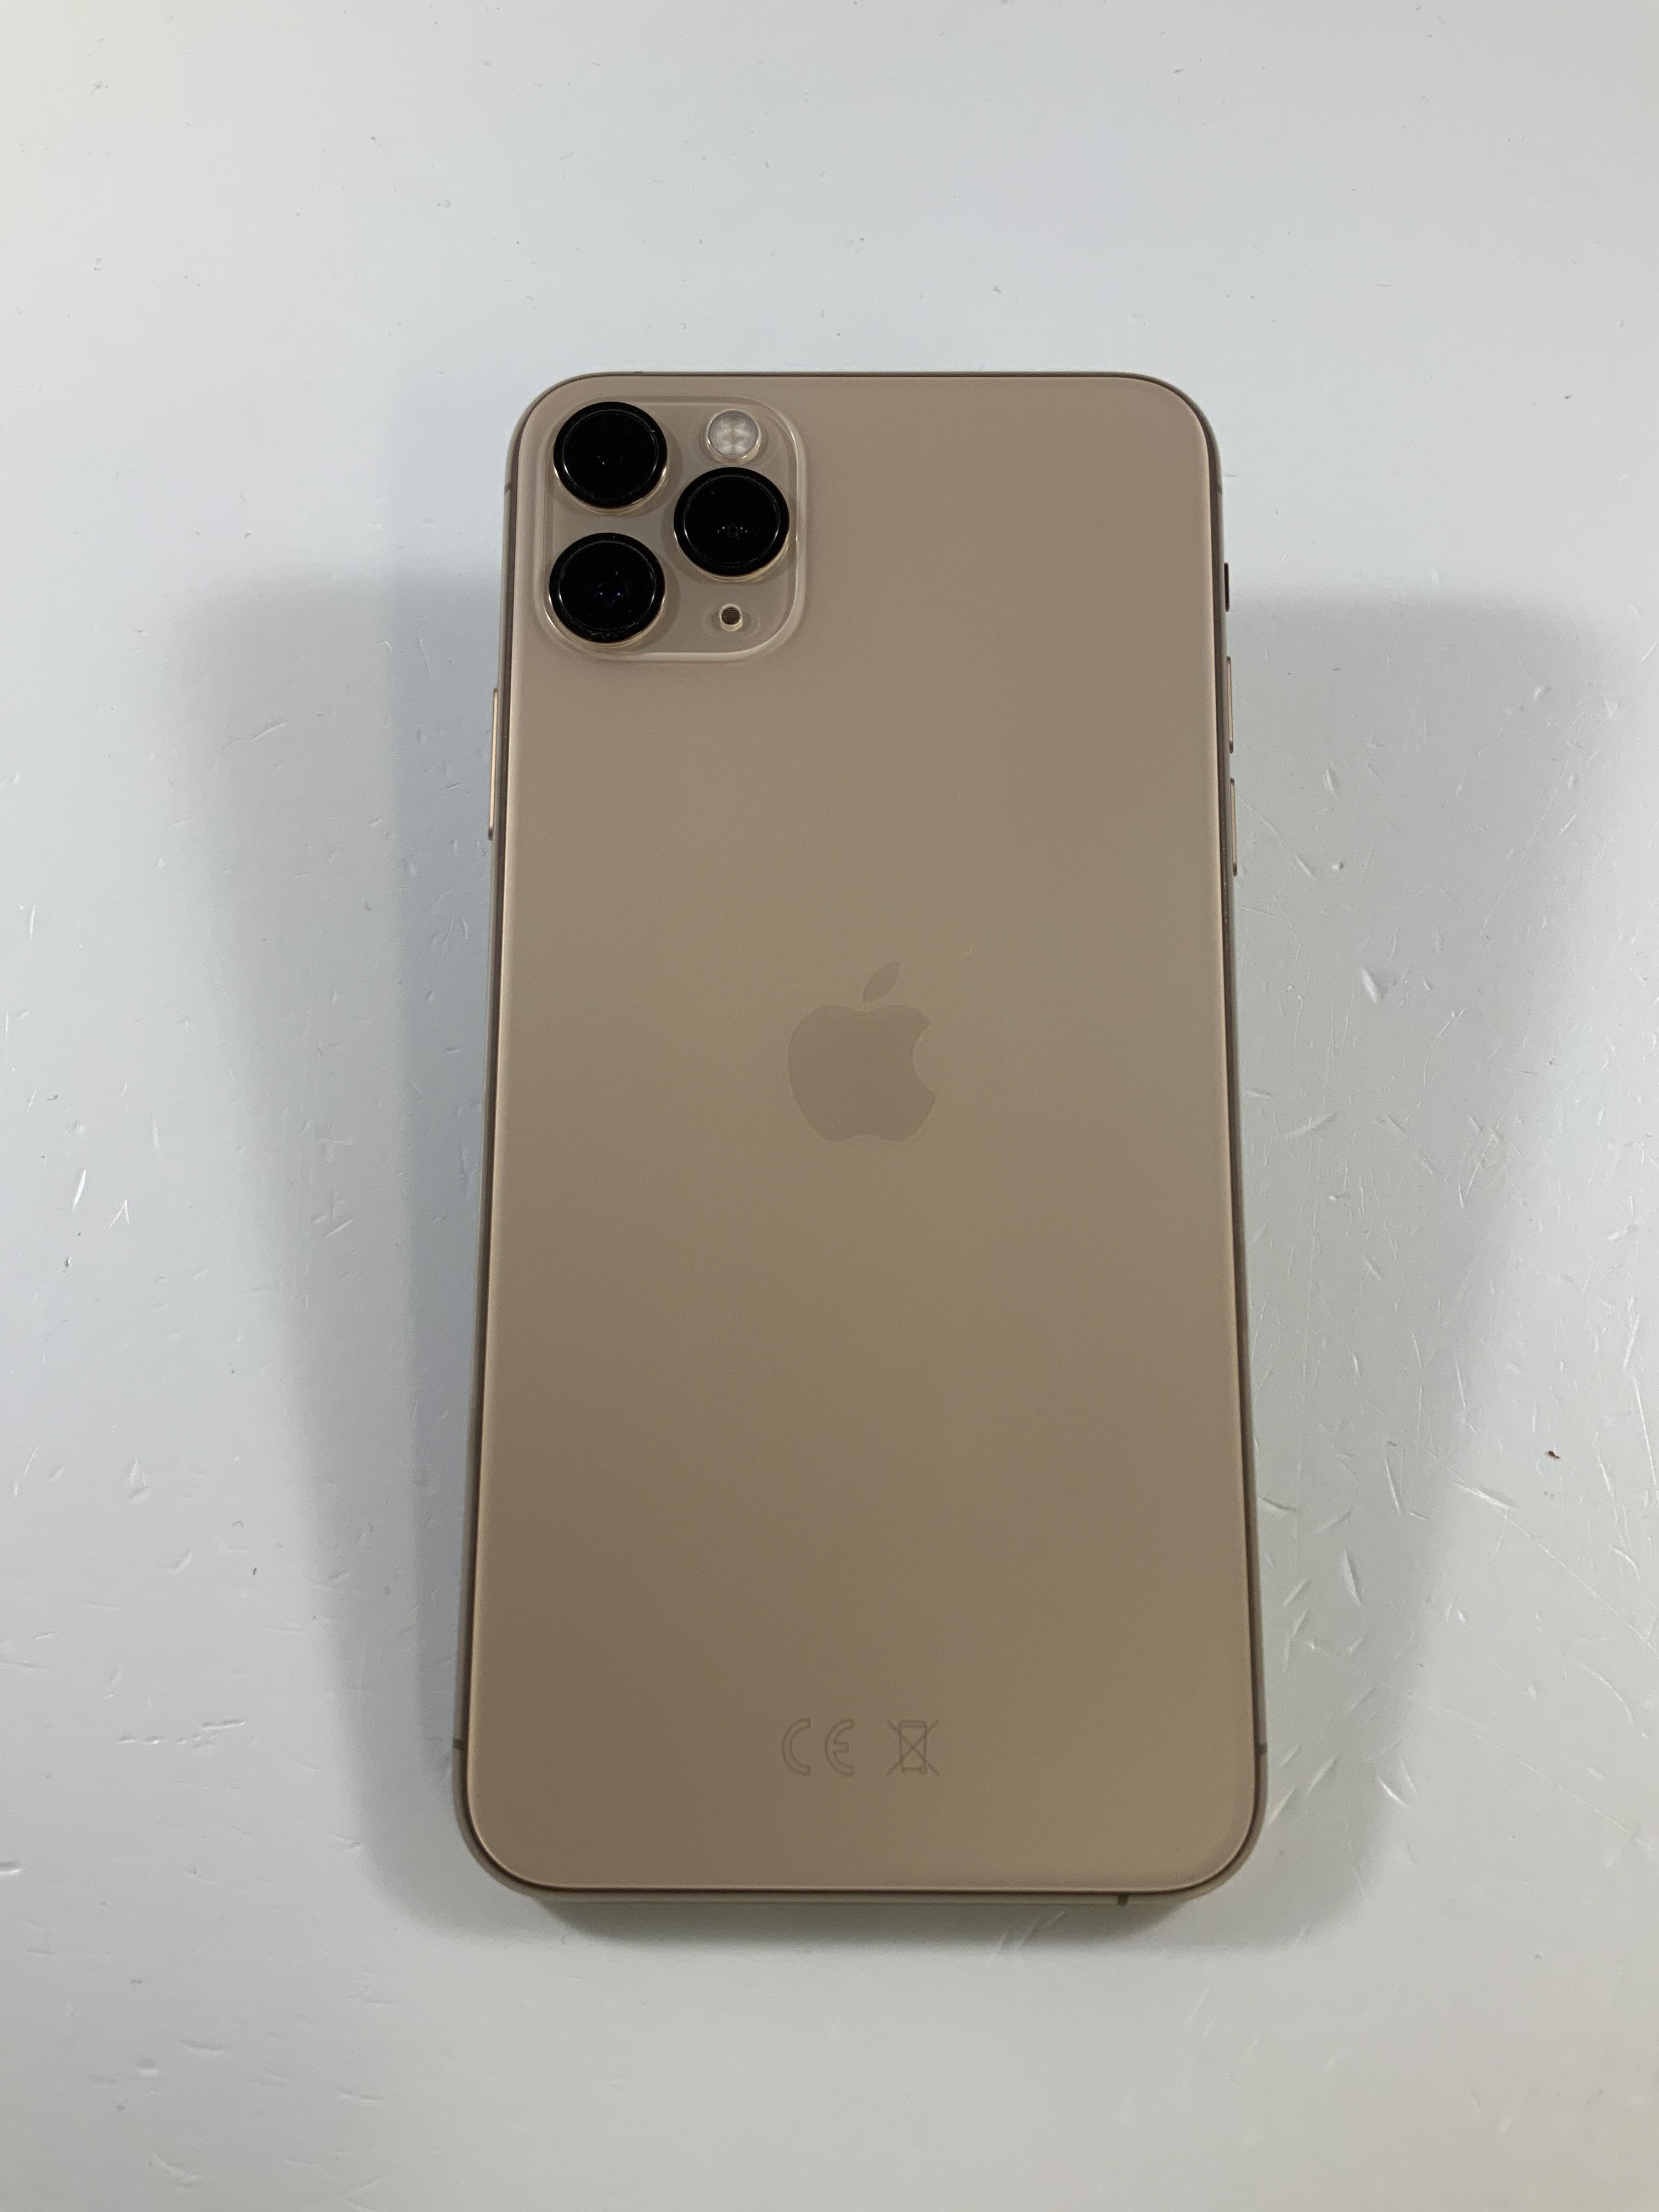 iPhone 11 Pro Max 256GB, 256GB, Gold, Afbeelding 2